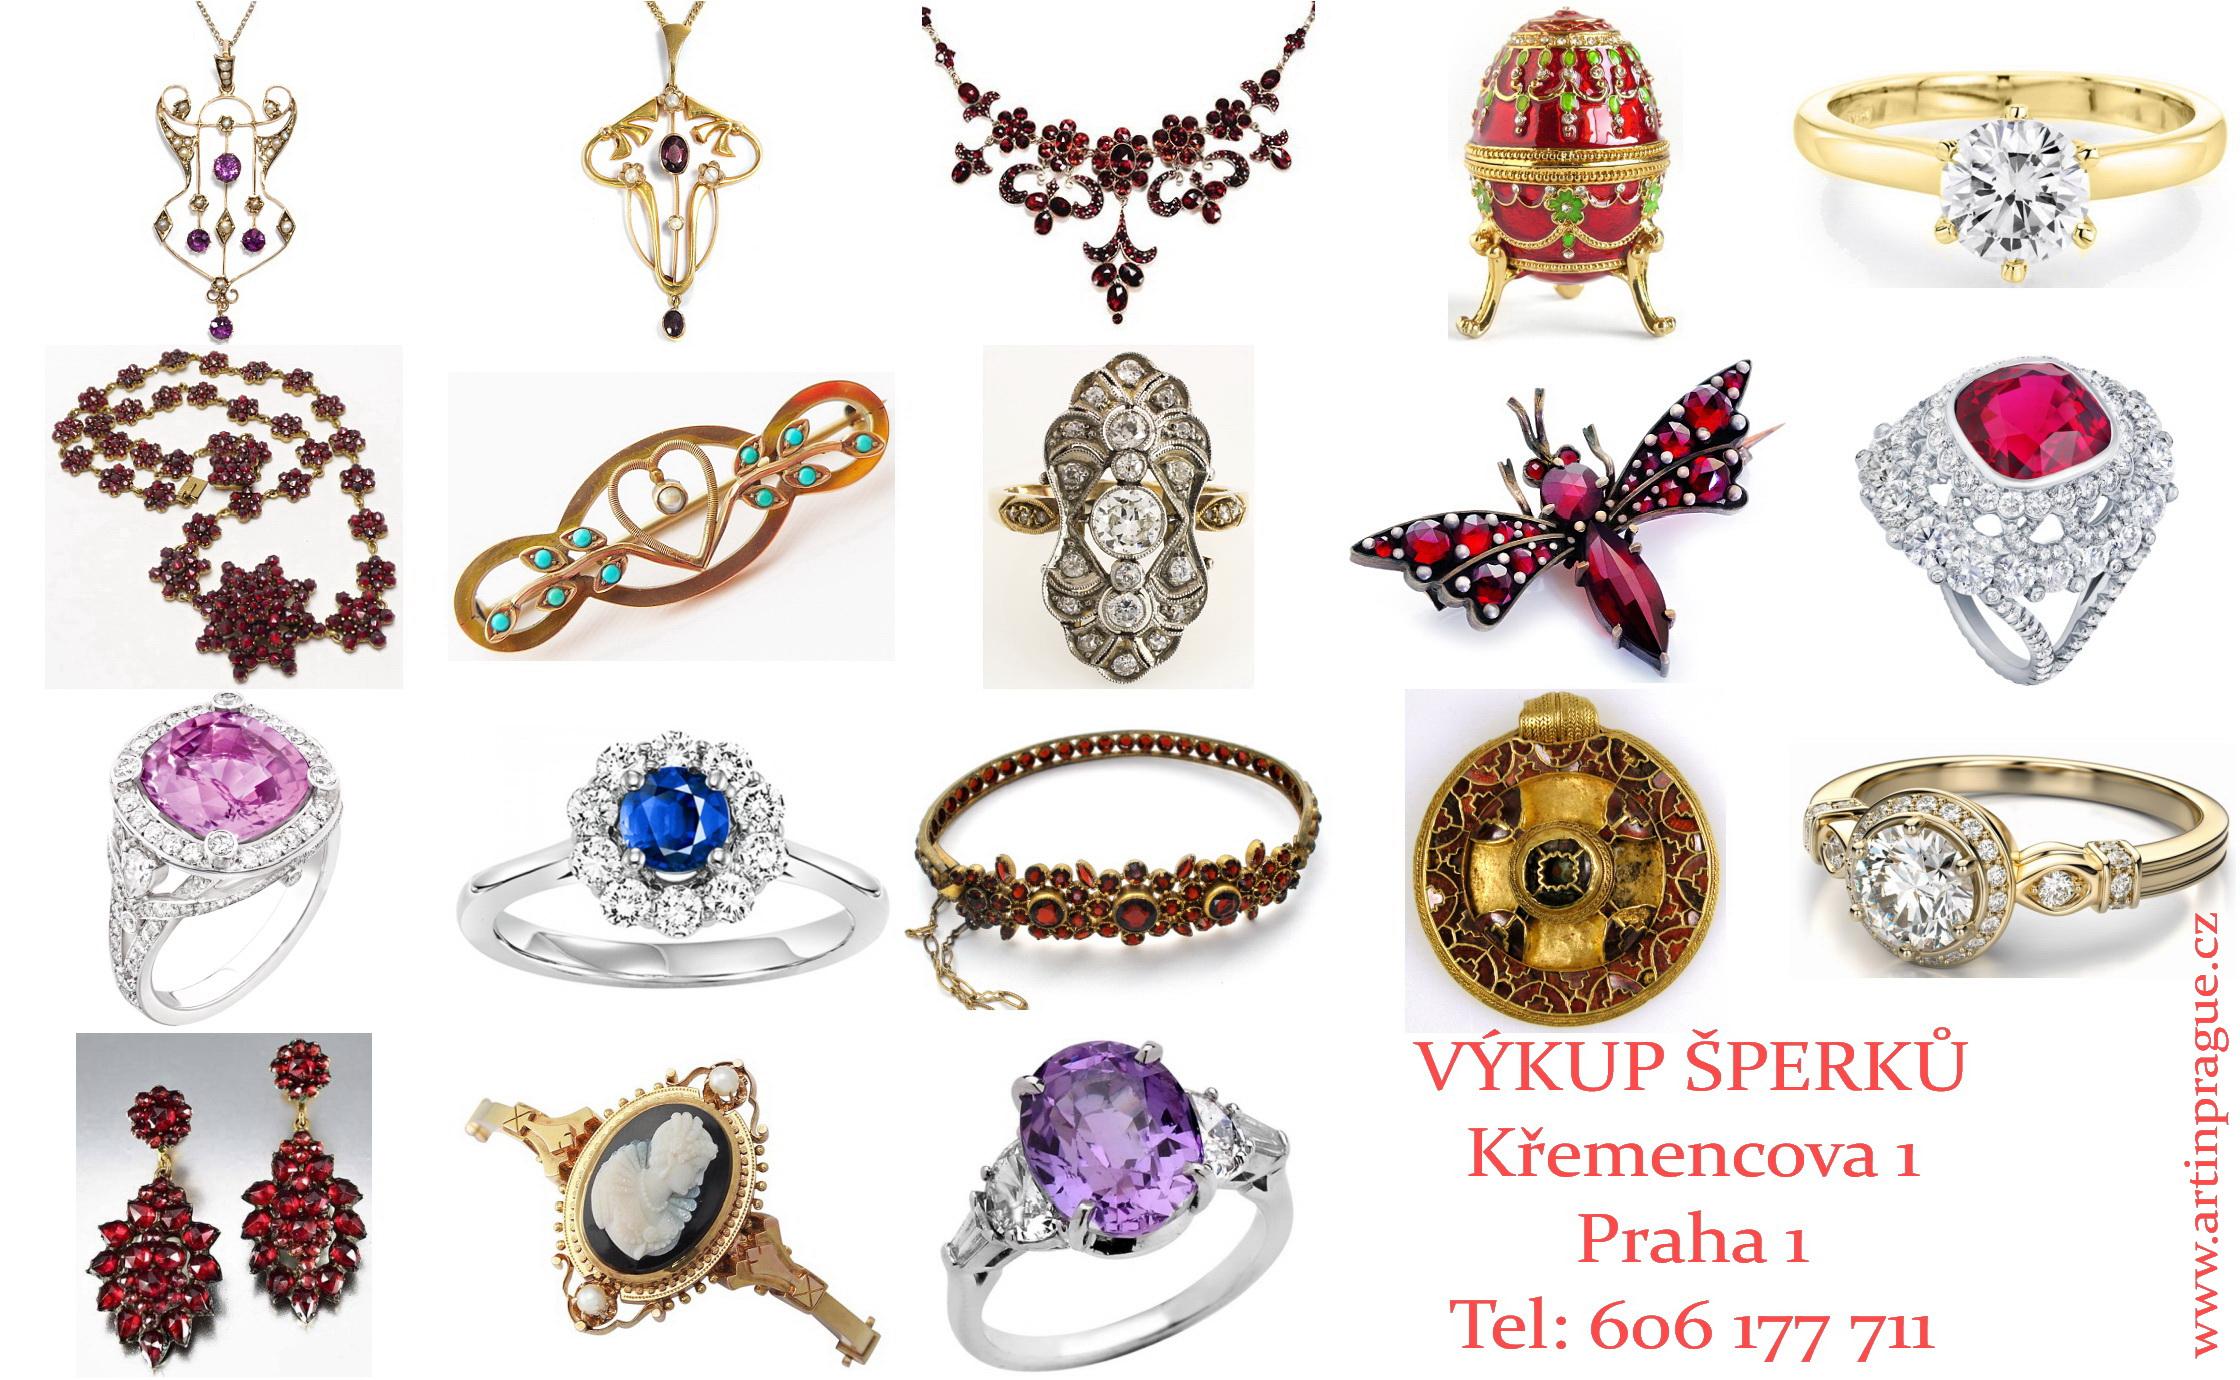 e75208217 Výkup zlata za hotové, výkup stříbra za hotové. Bazar starých šperků. Výkup  starožitností v Praze. Kde a jak prodat starožitný šperk - volejte na tel.